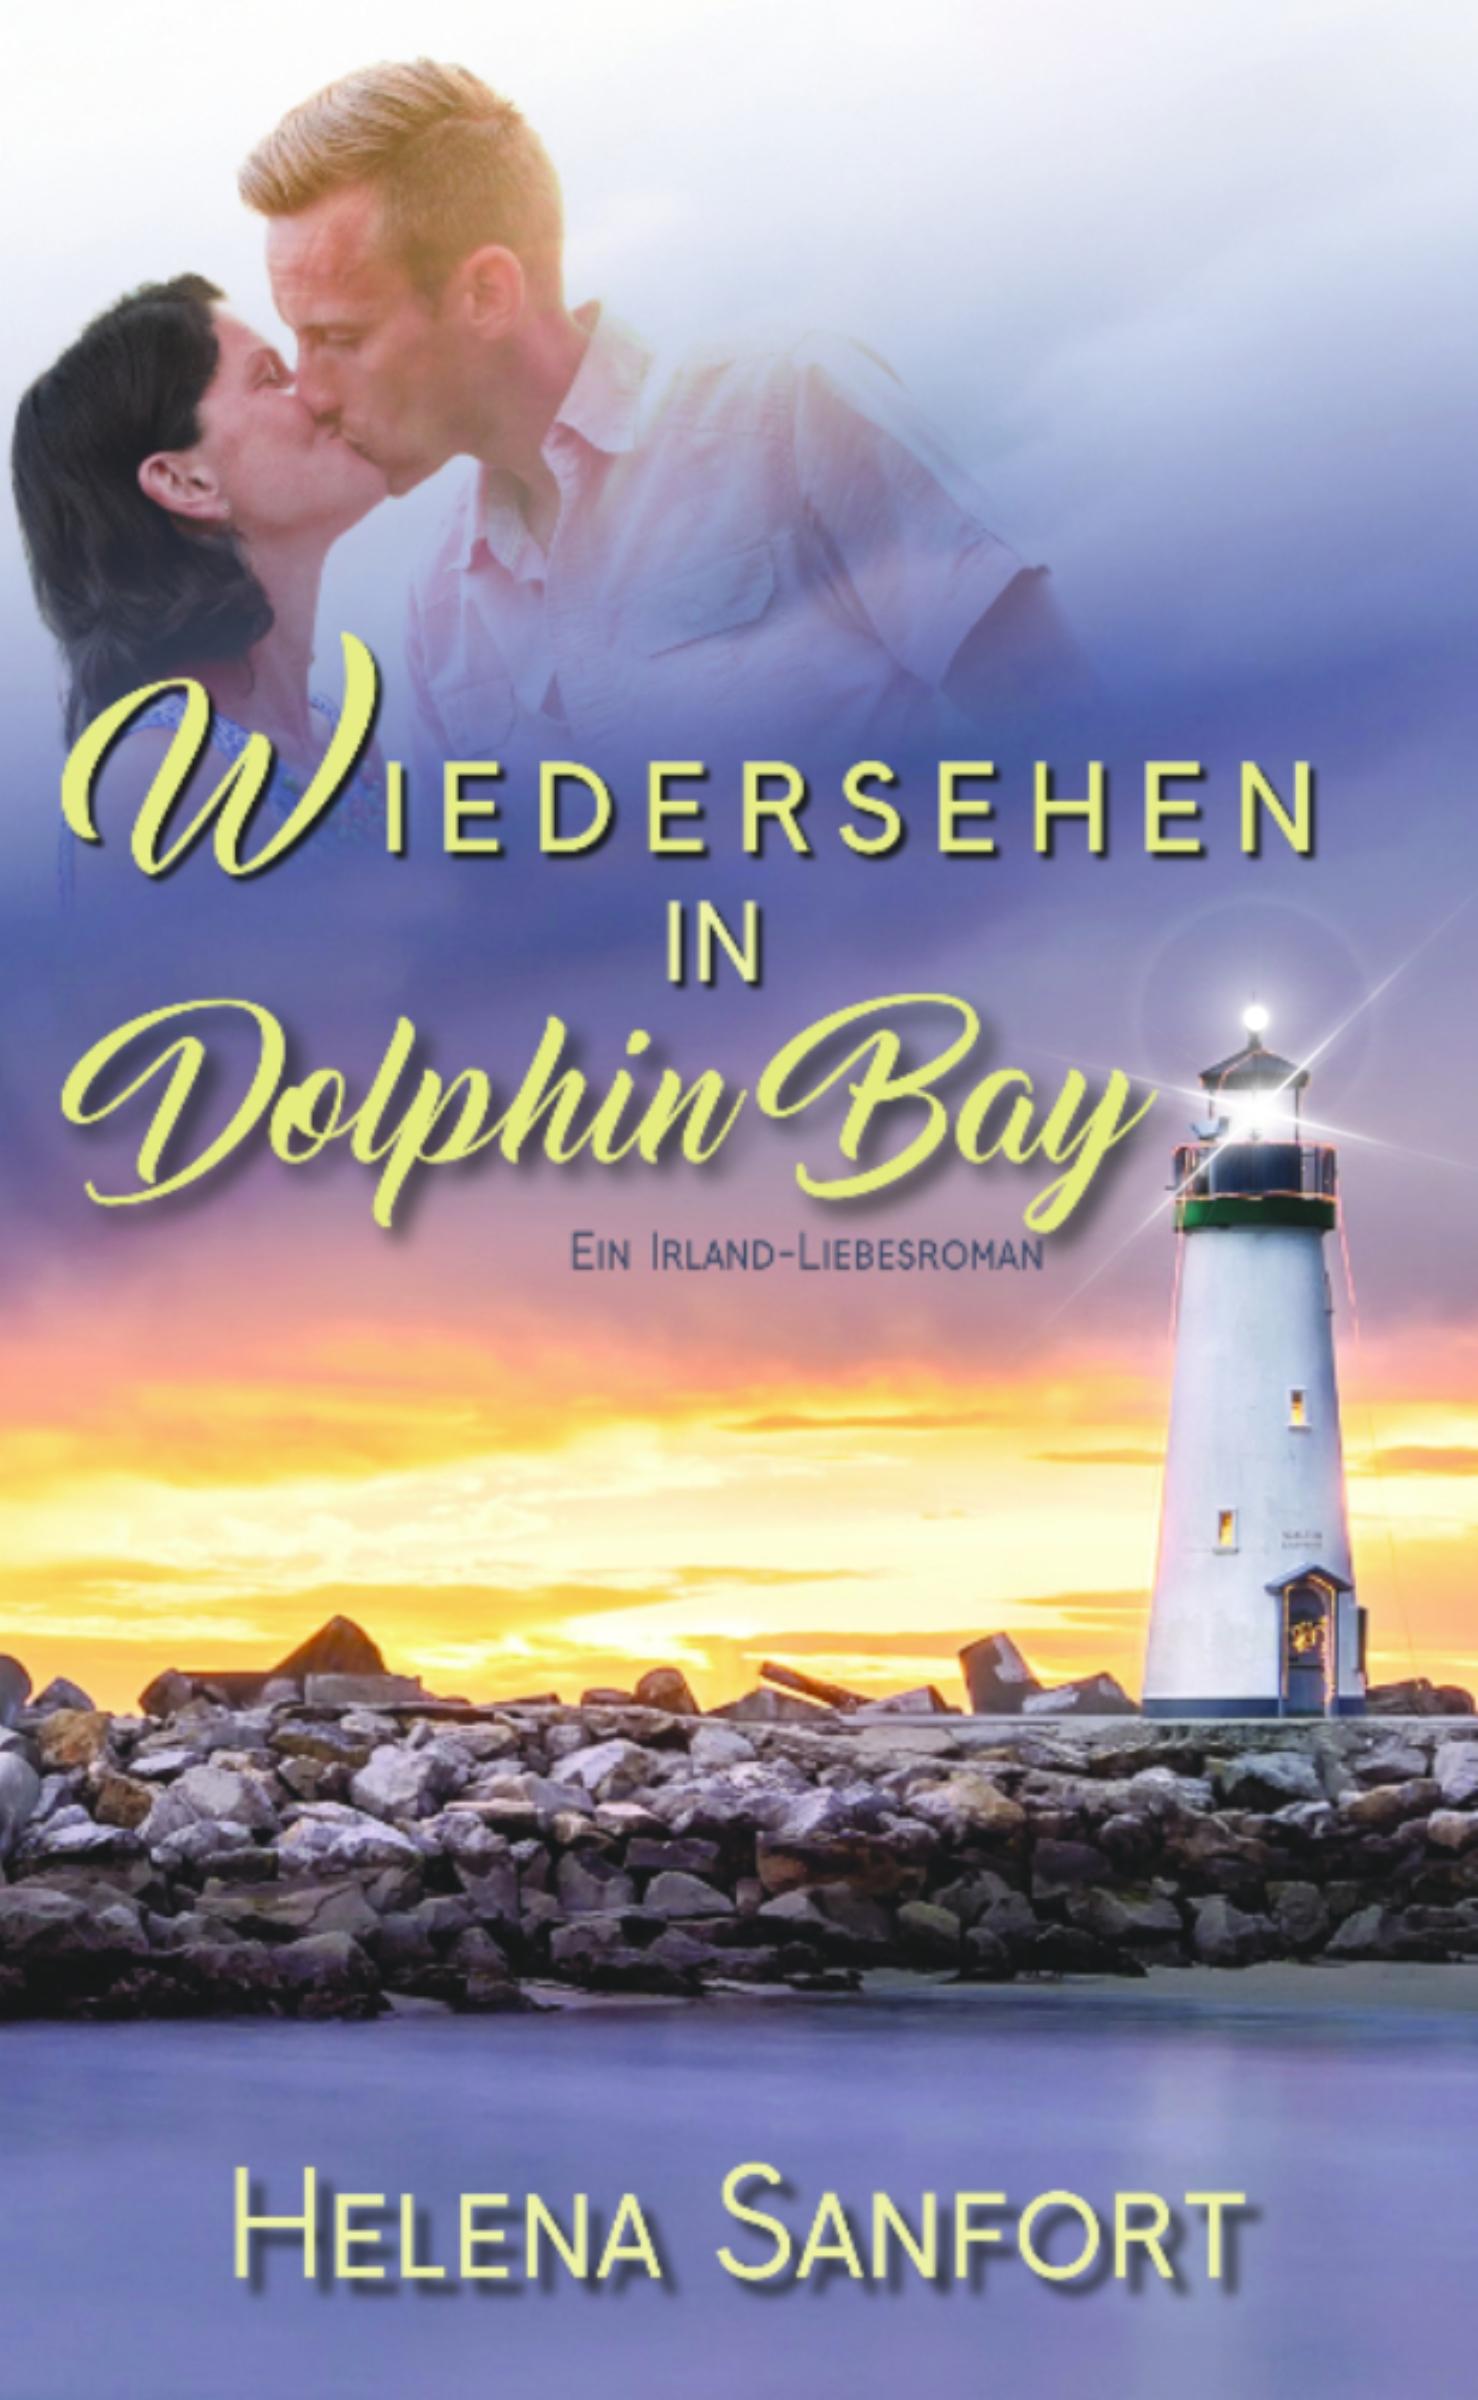 Wiedersehen in Dolphin Bay Buchcover